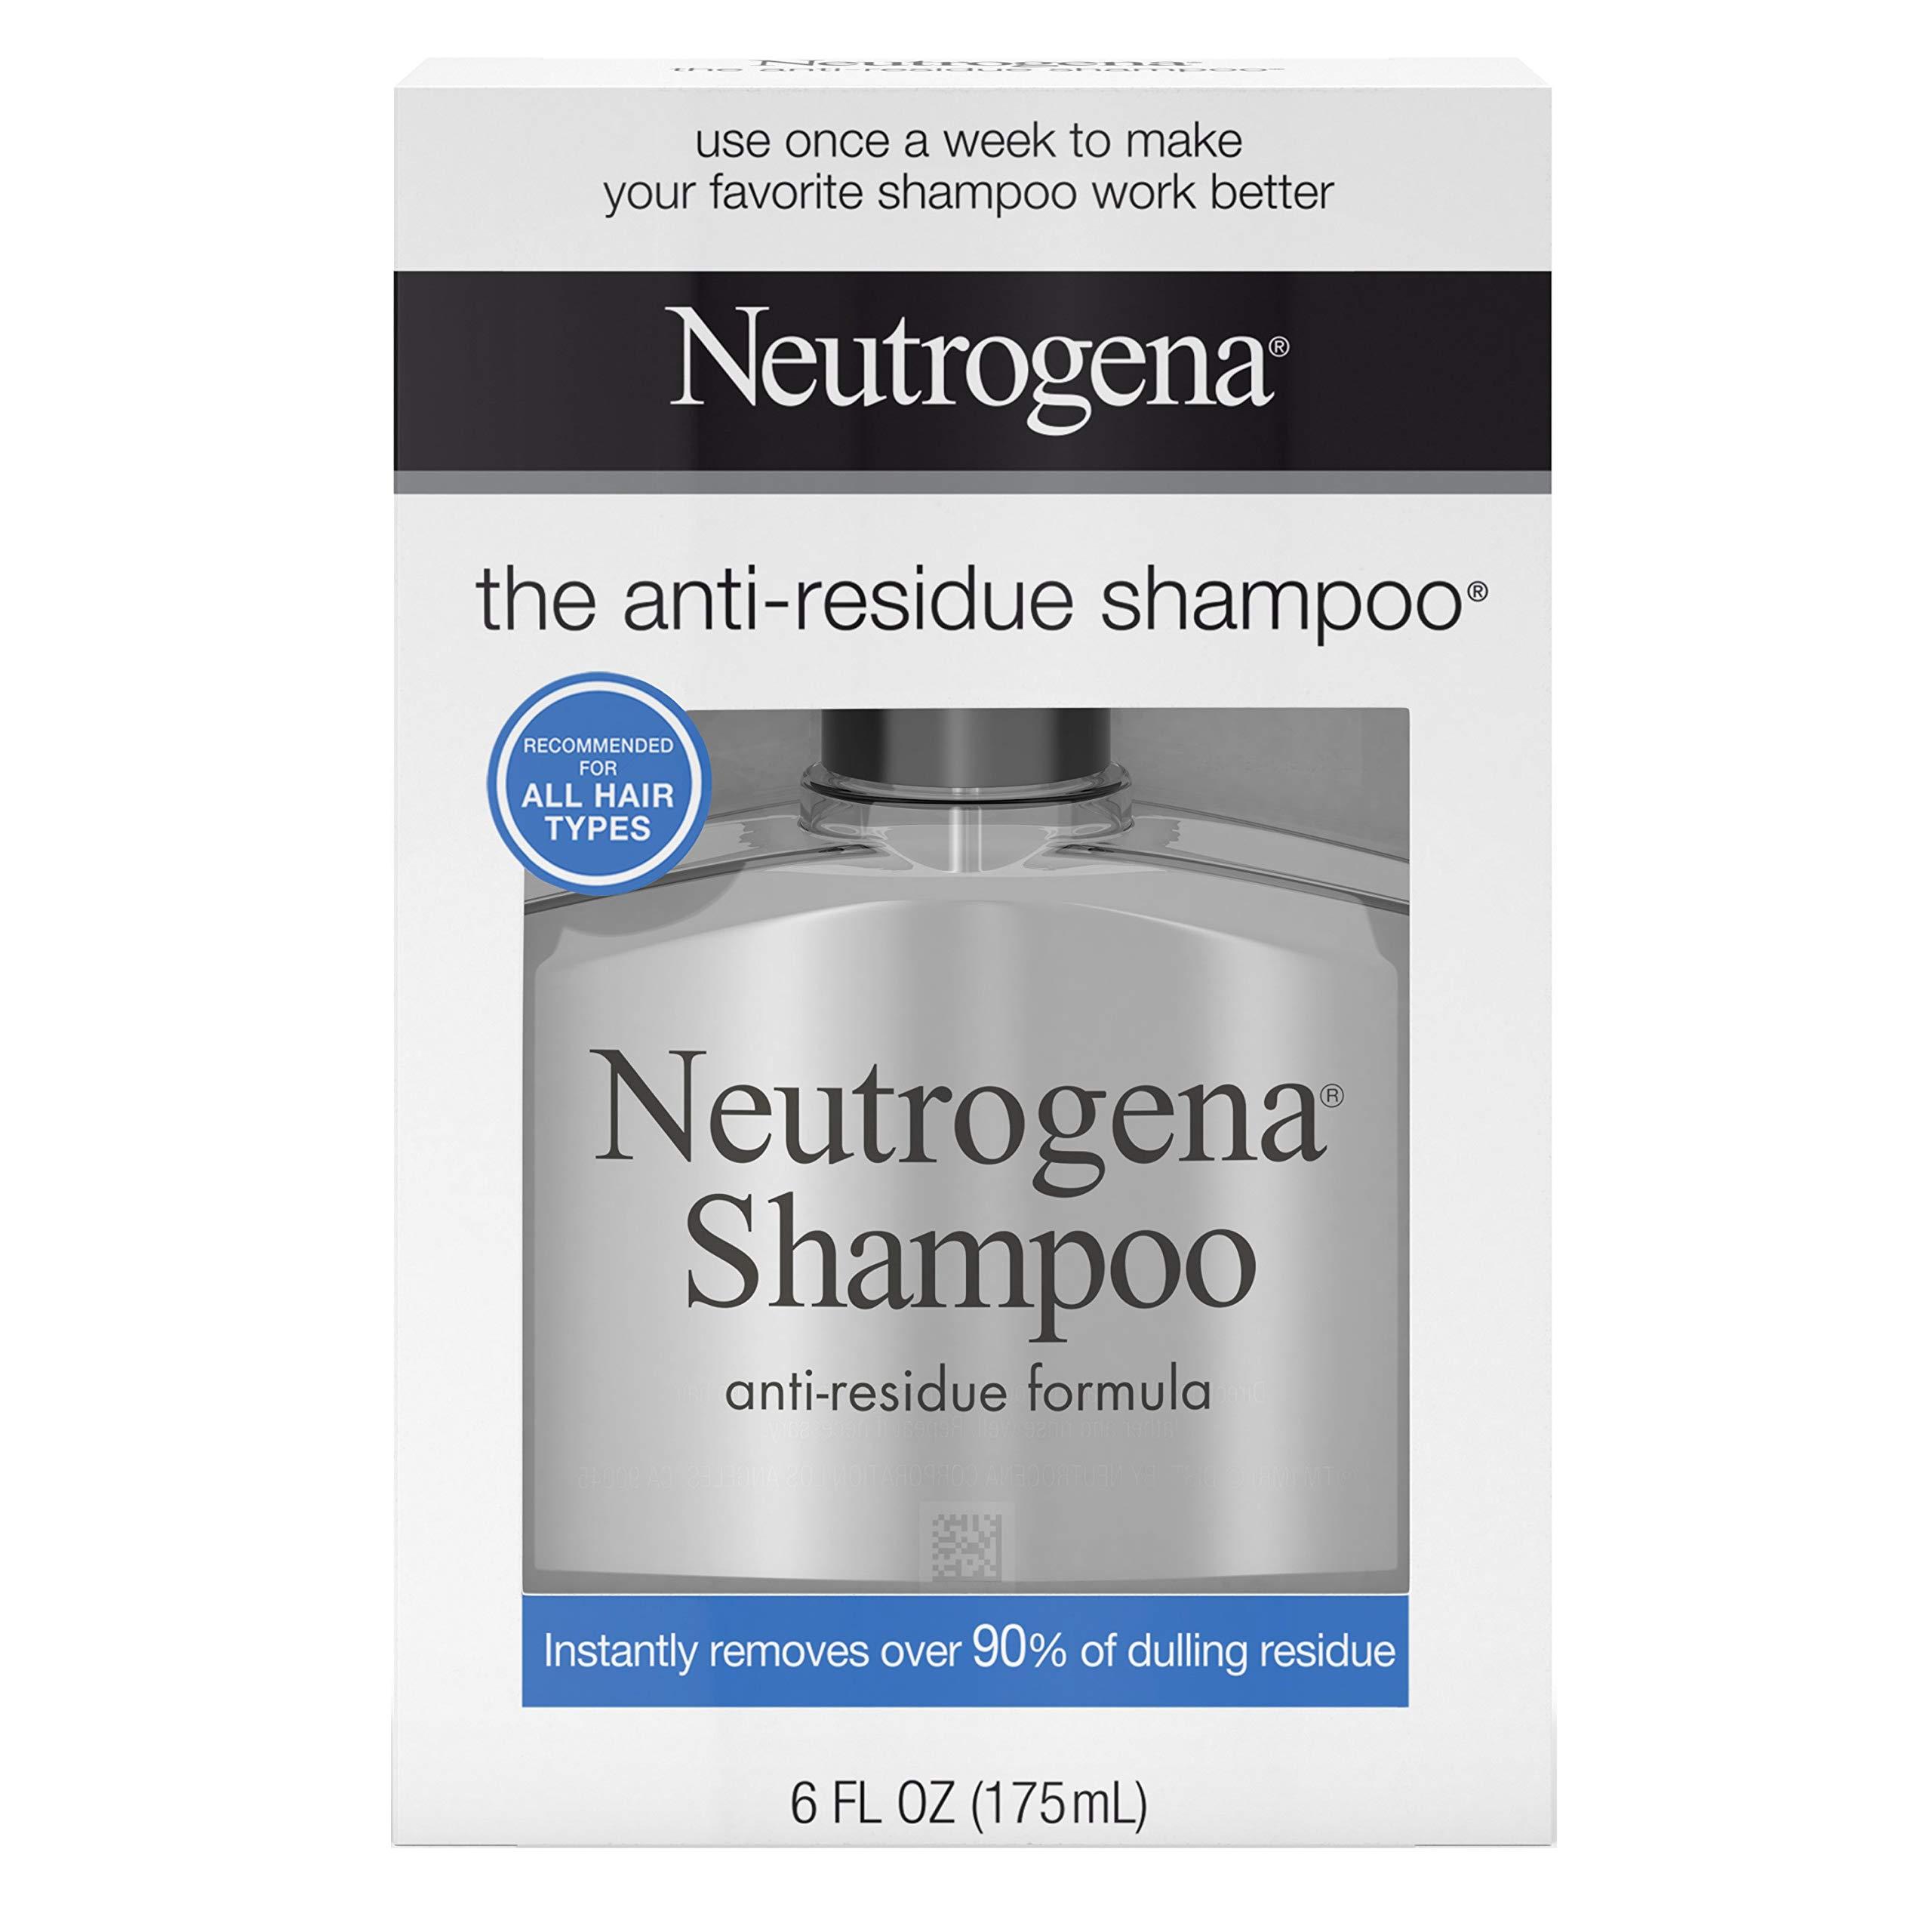 Neutrogena Anti-Residue Shampoo 6 oz (Pack of 11) by Neutrogena